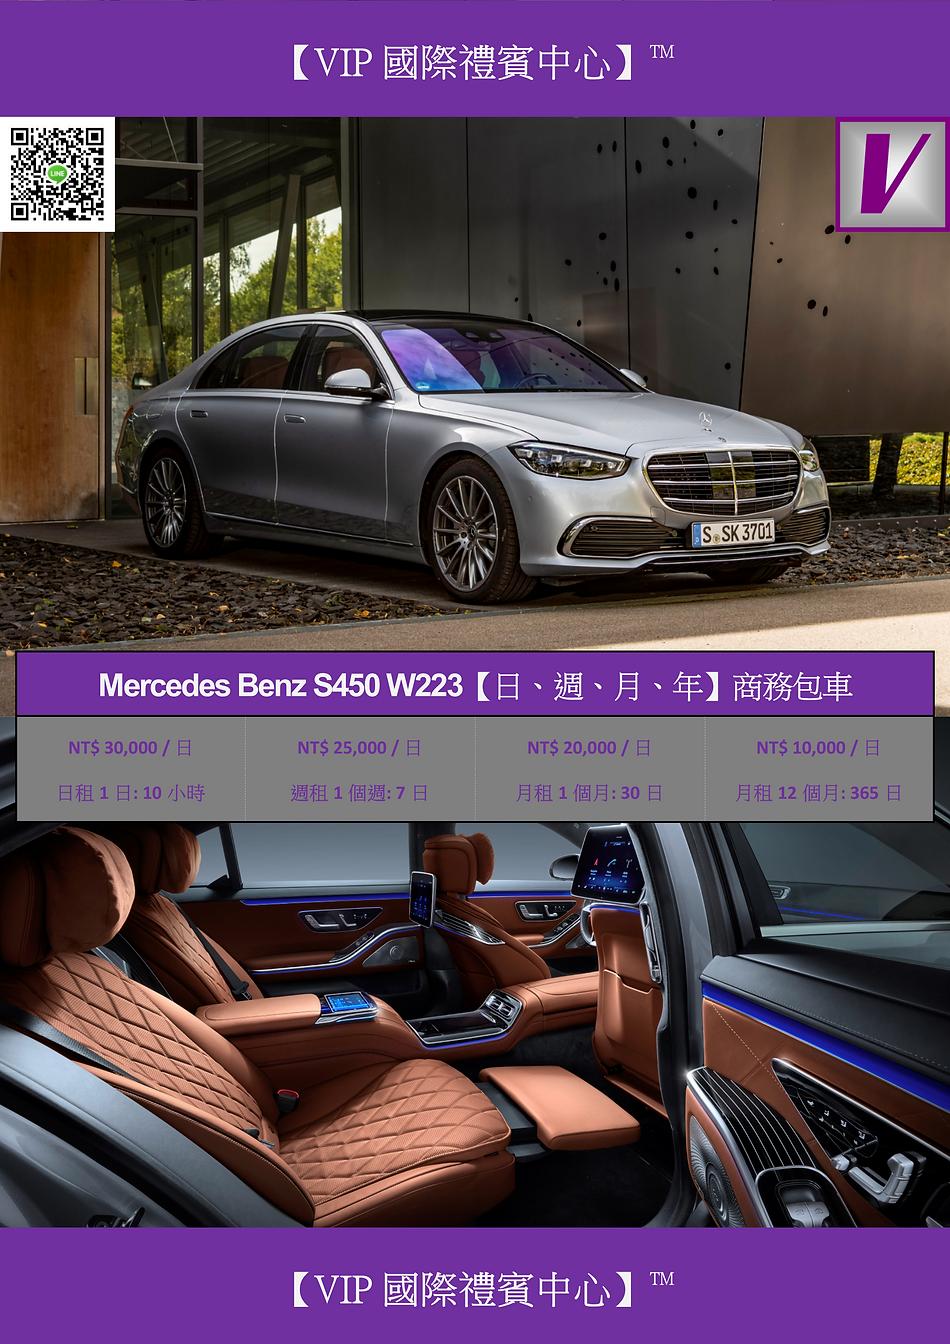 VIP國際禮賓中心 MERCEDES BENZ S450 W223 DM.png